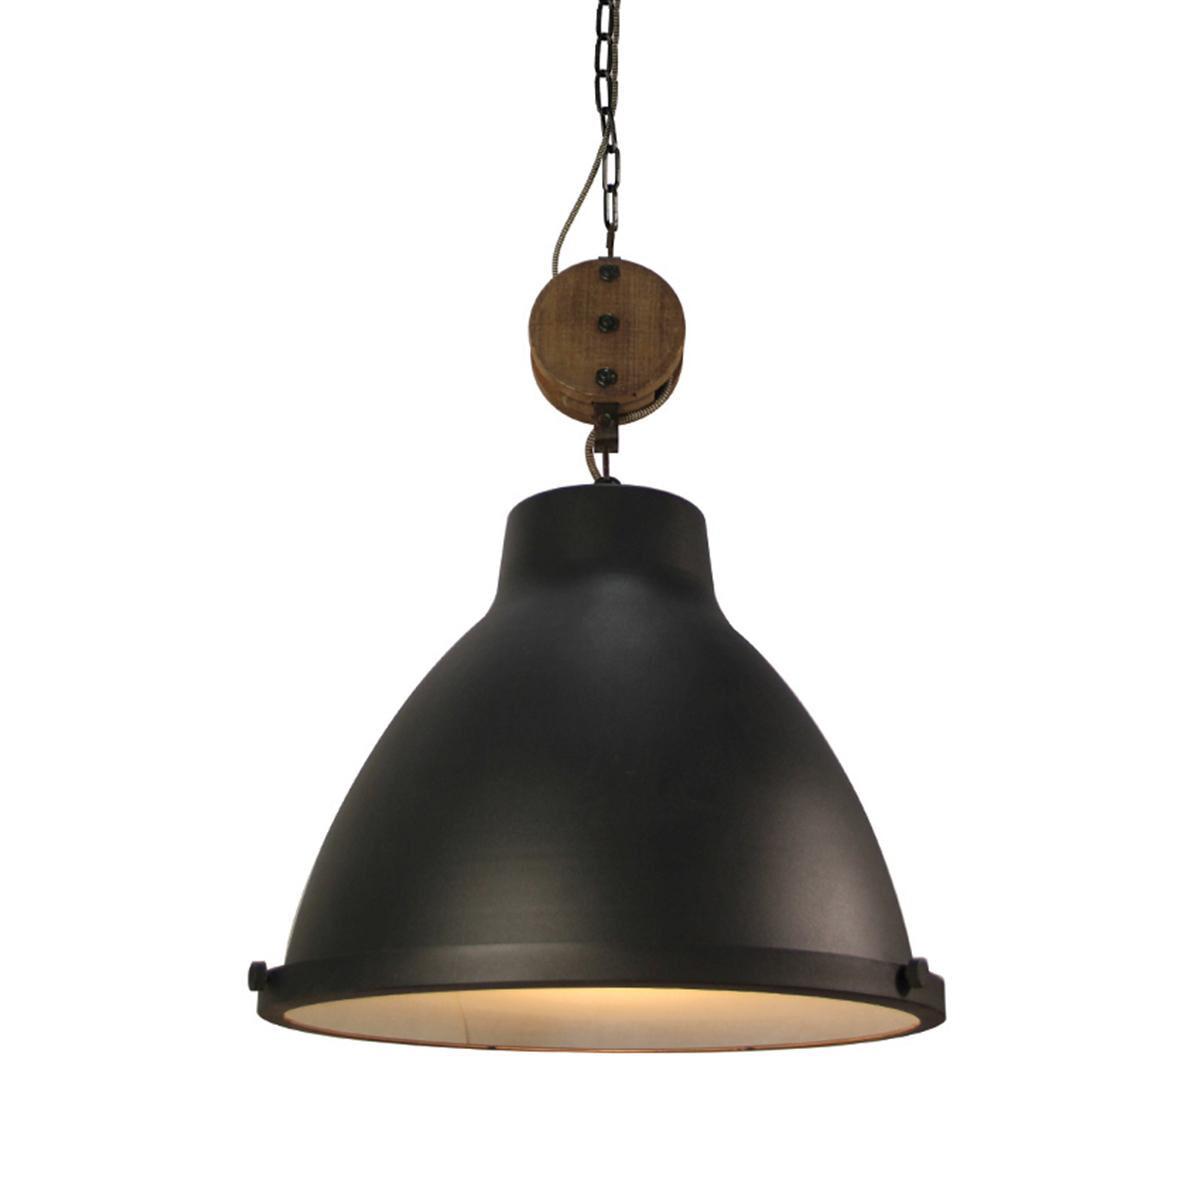 LABEL51 hanglamp 'Dock' 42cm